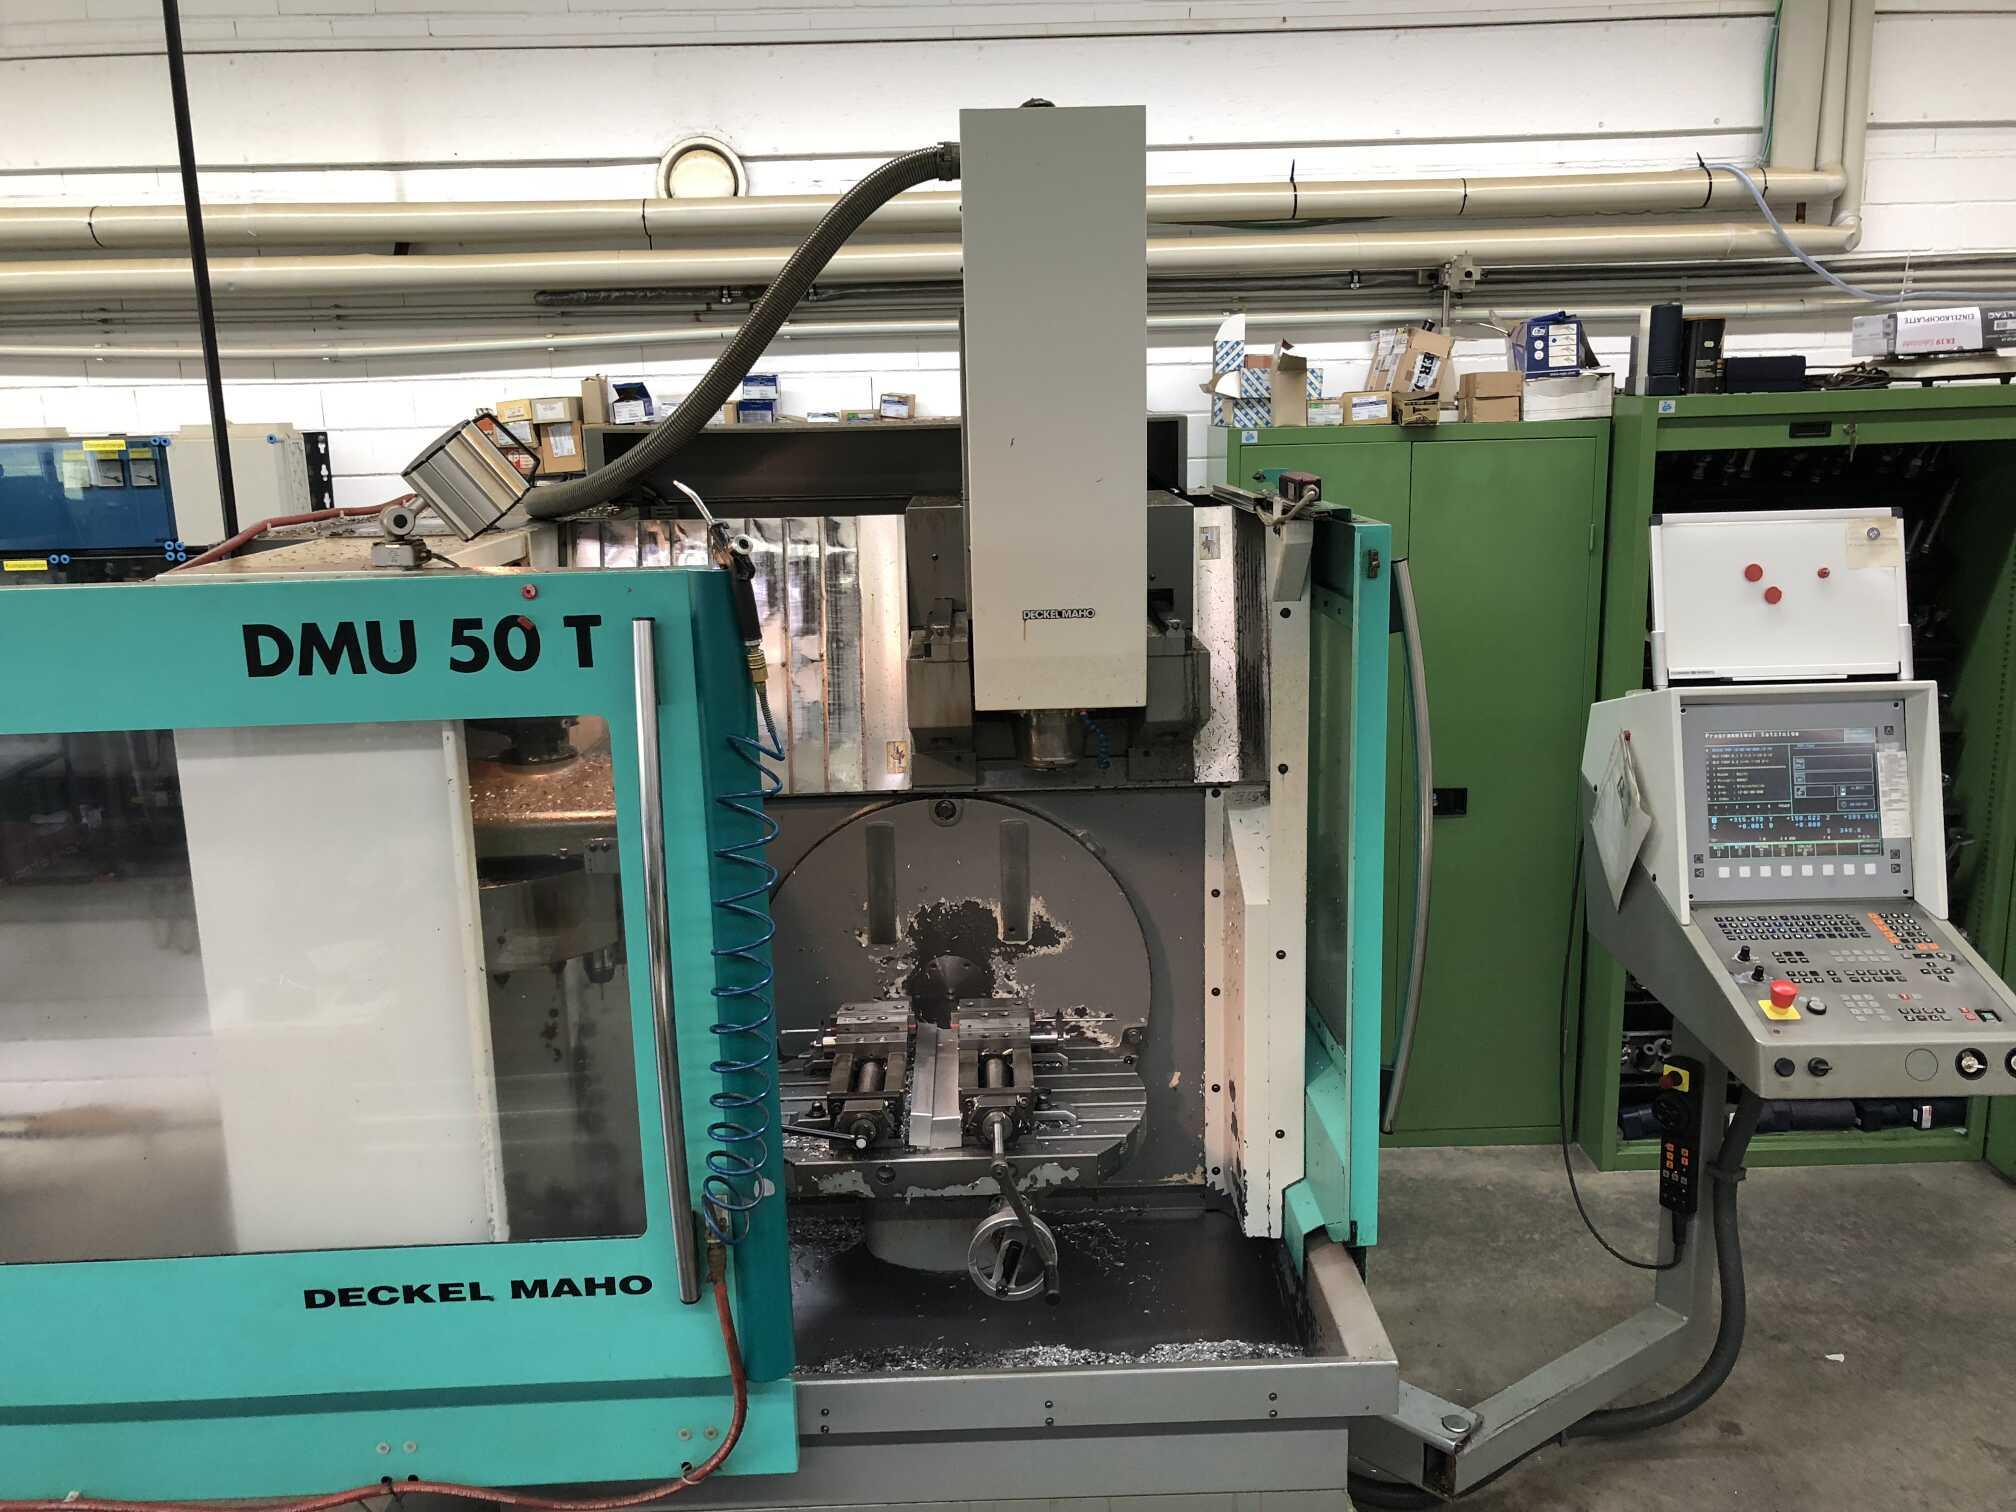 used  Universal Milling Machine Deckel Maho DMU 50 T